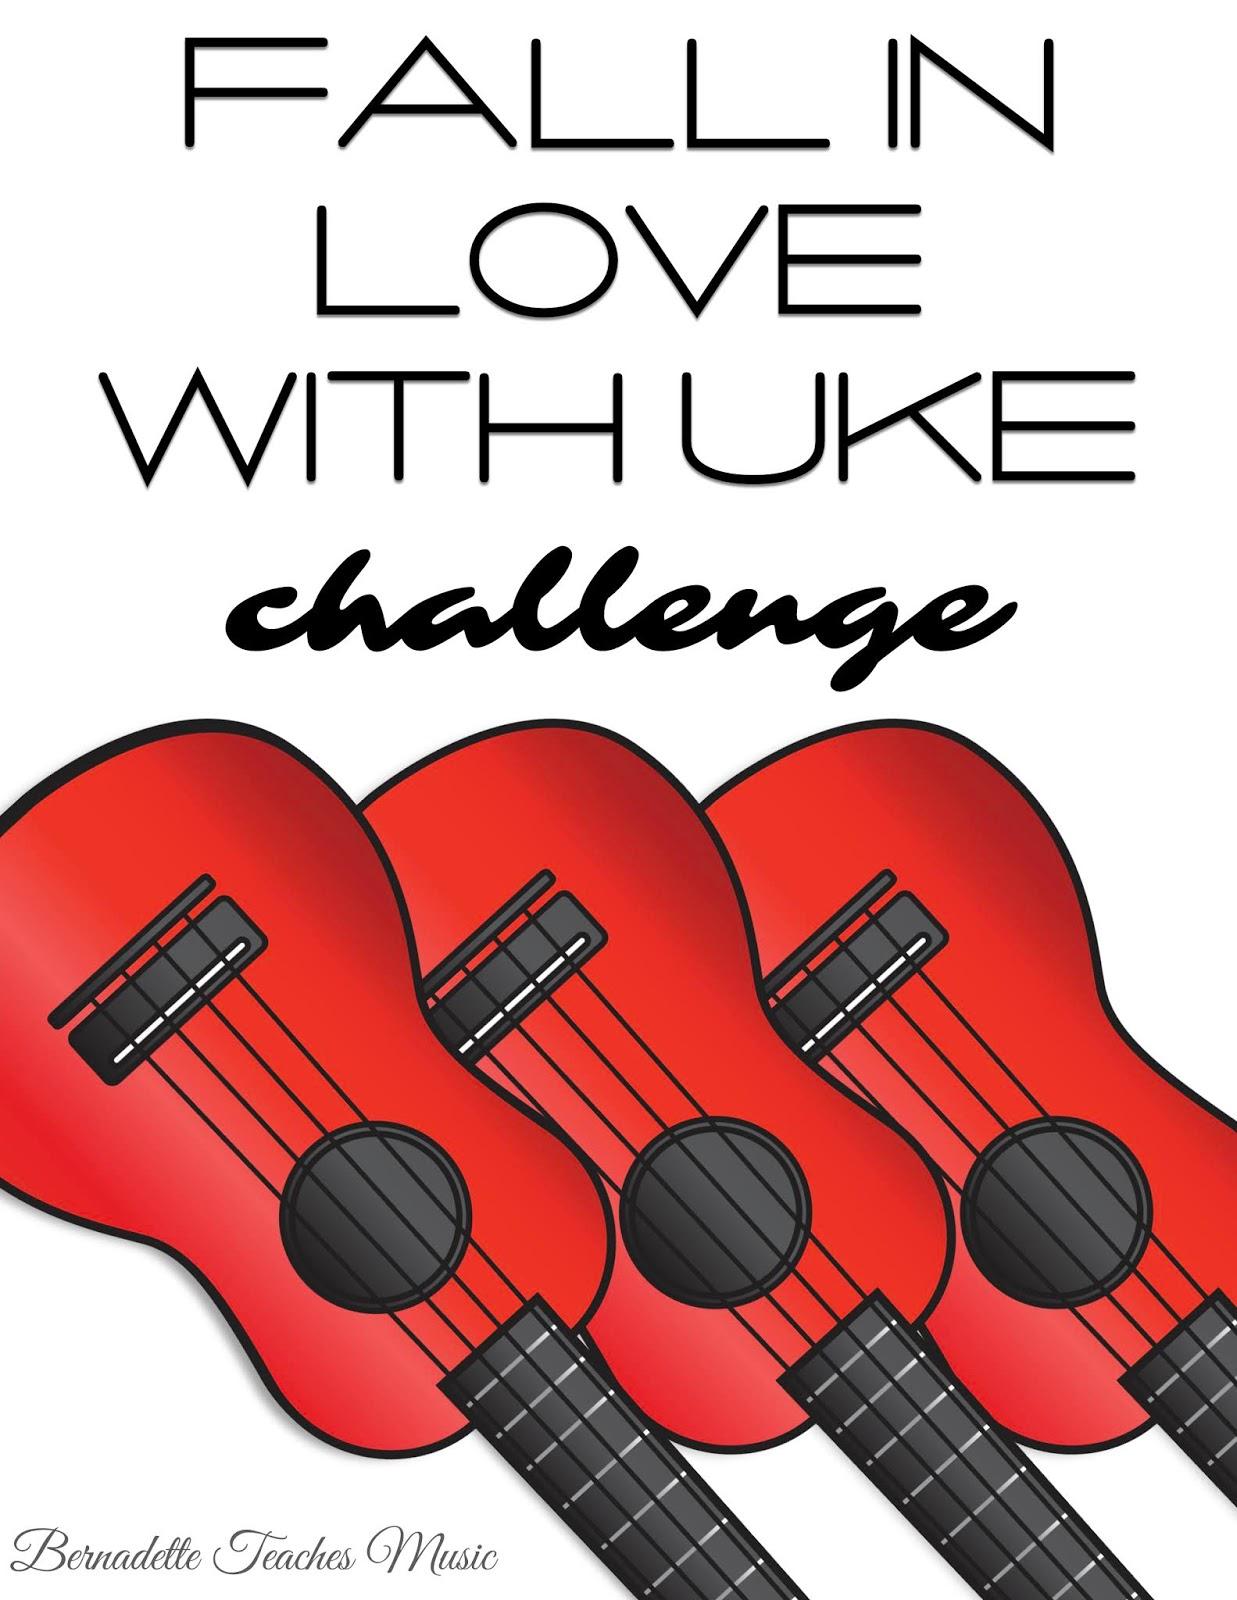 Download Lagu Ukulele : download, ukulele, Songs, Ukulele, Challenge, Bernadette, Teaches, Music